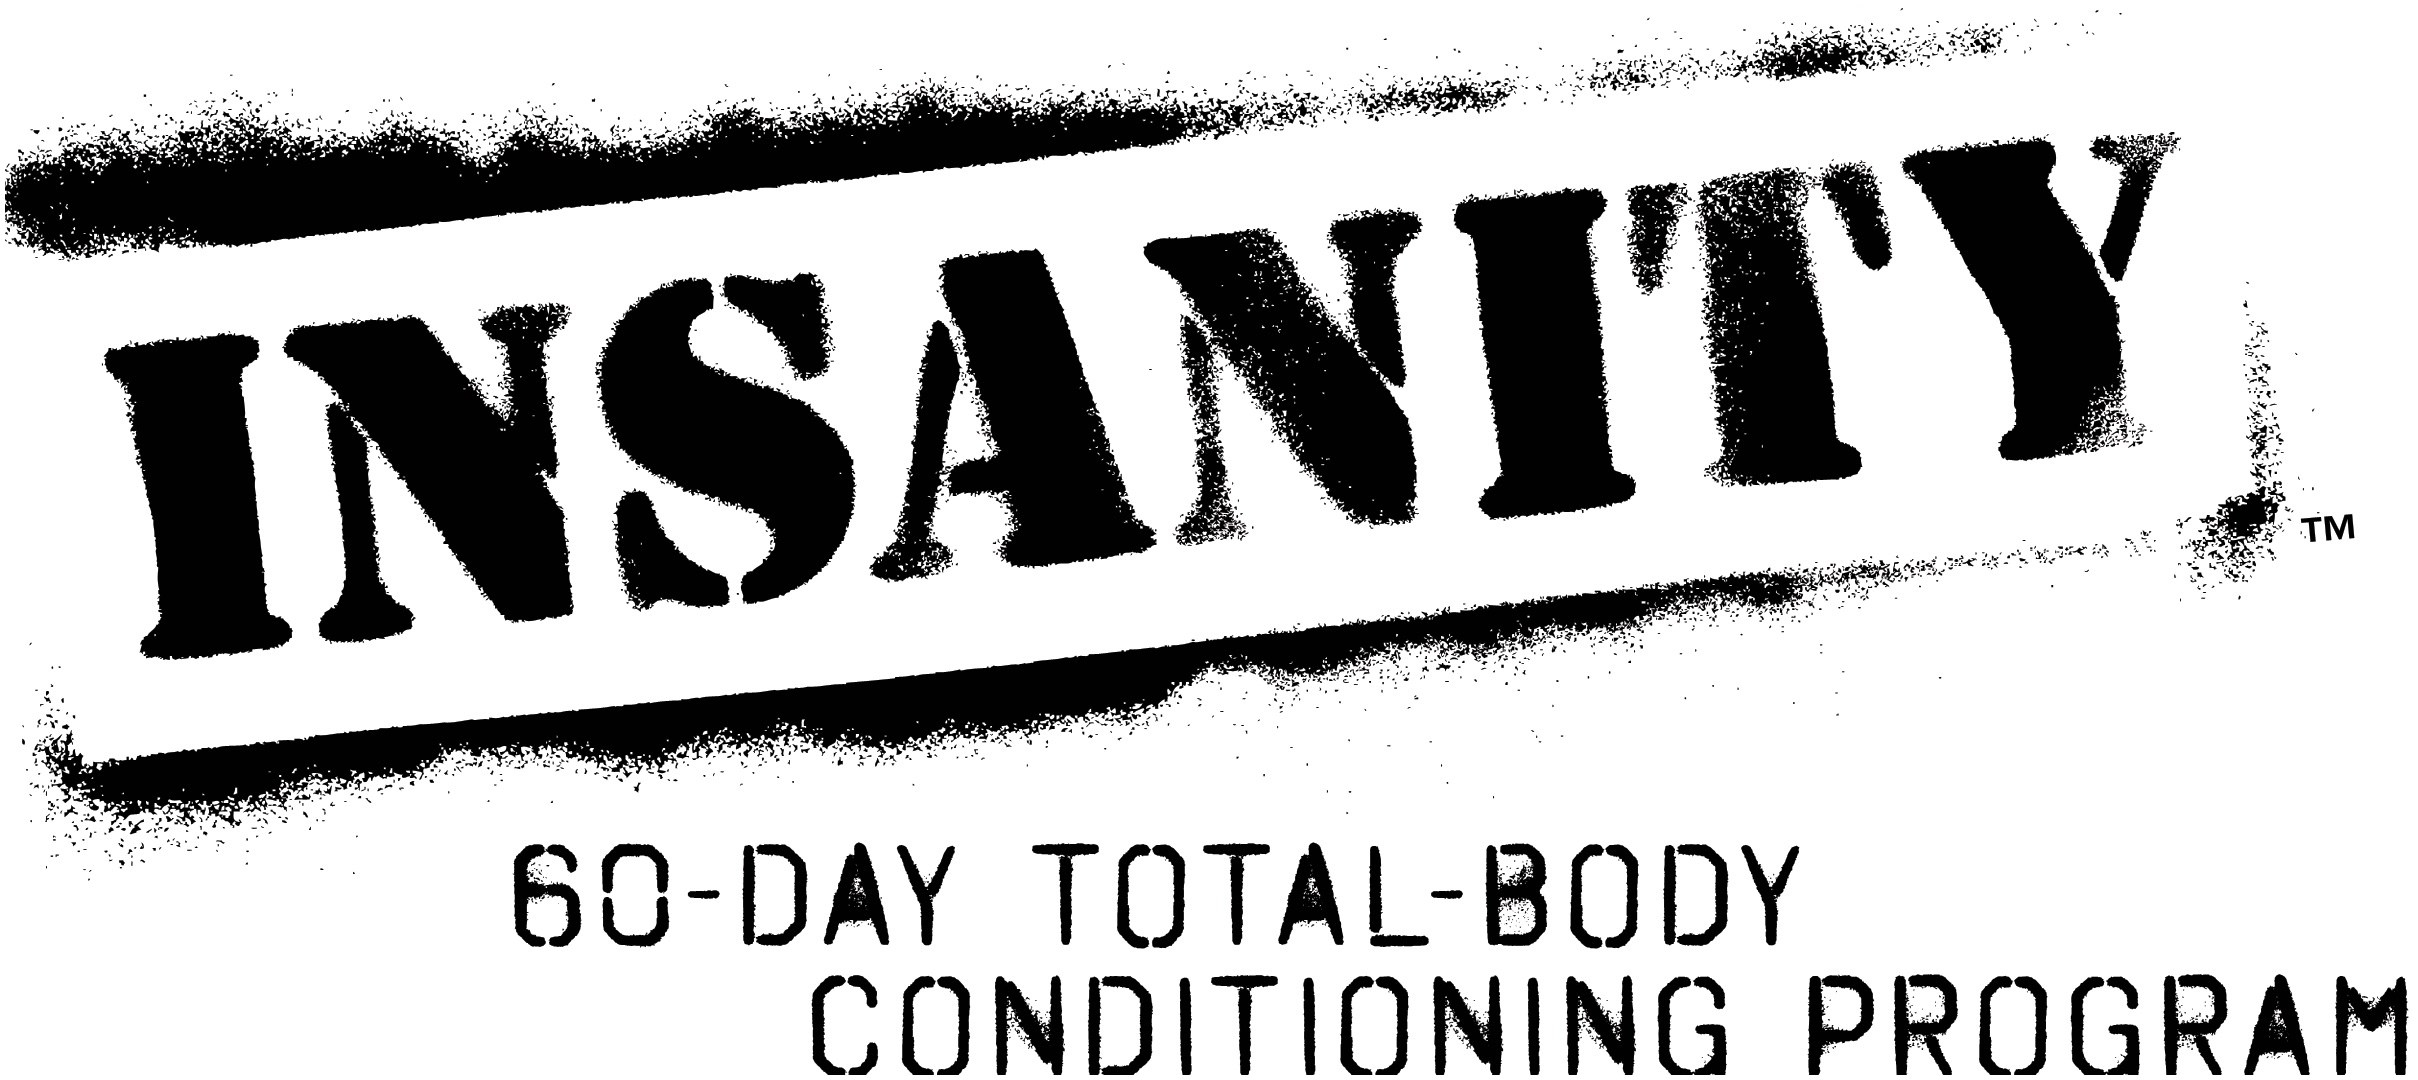 Insanity Asylum Volume 2 Calendar Focus T25 – Angie In Progress for The Insanity 60 Day Wall Calendar